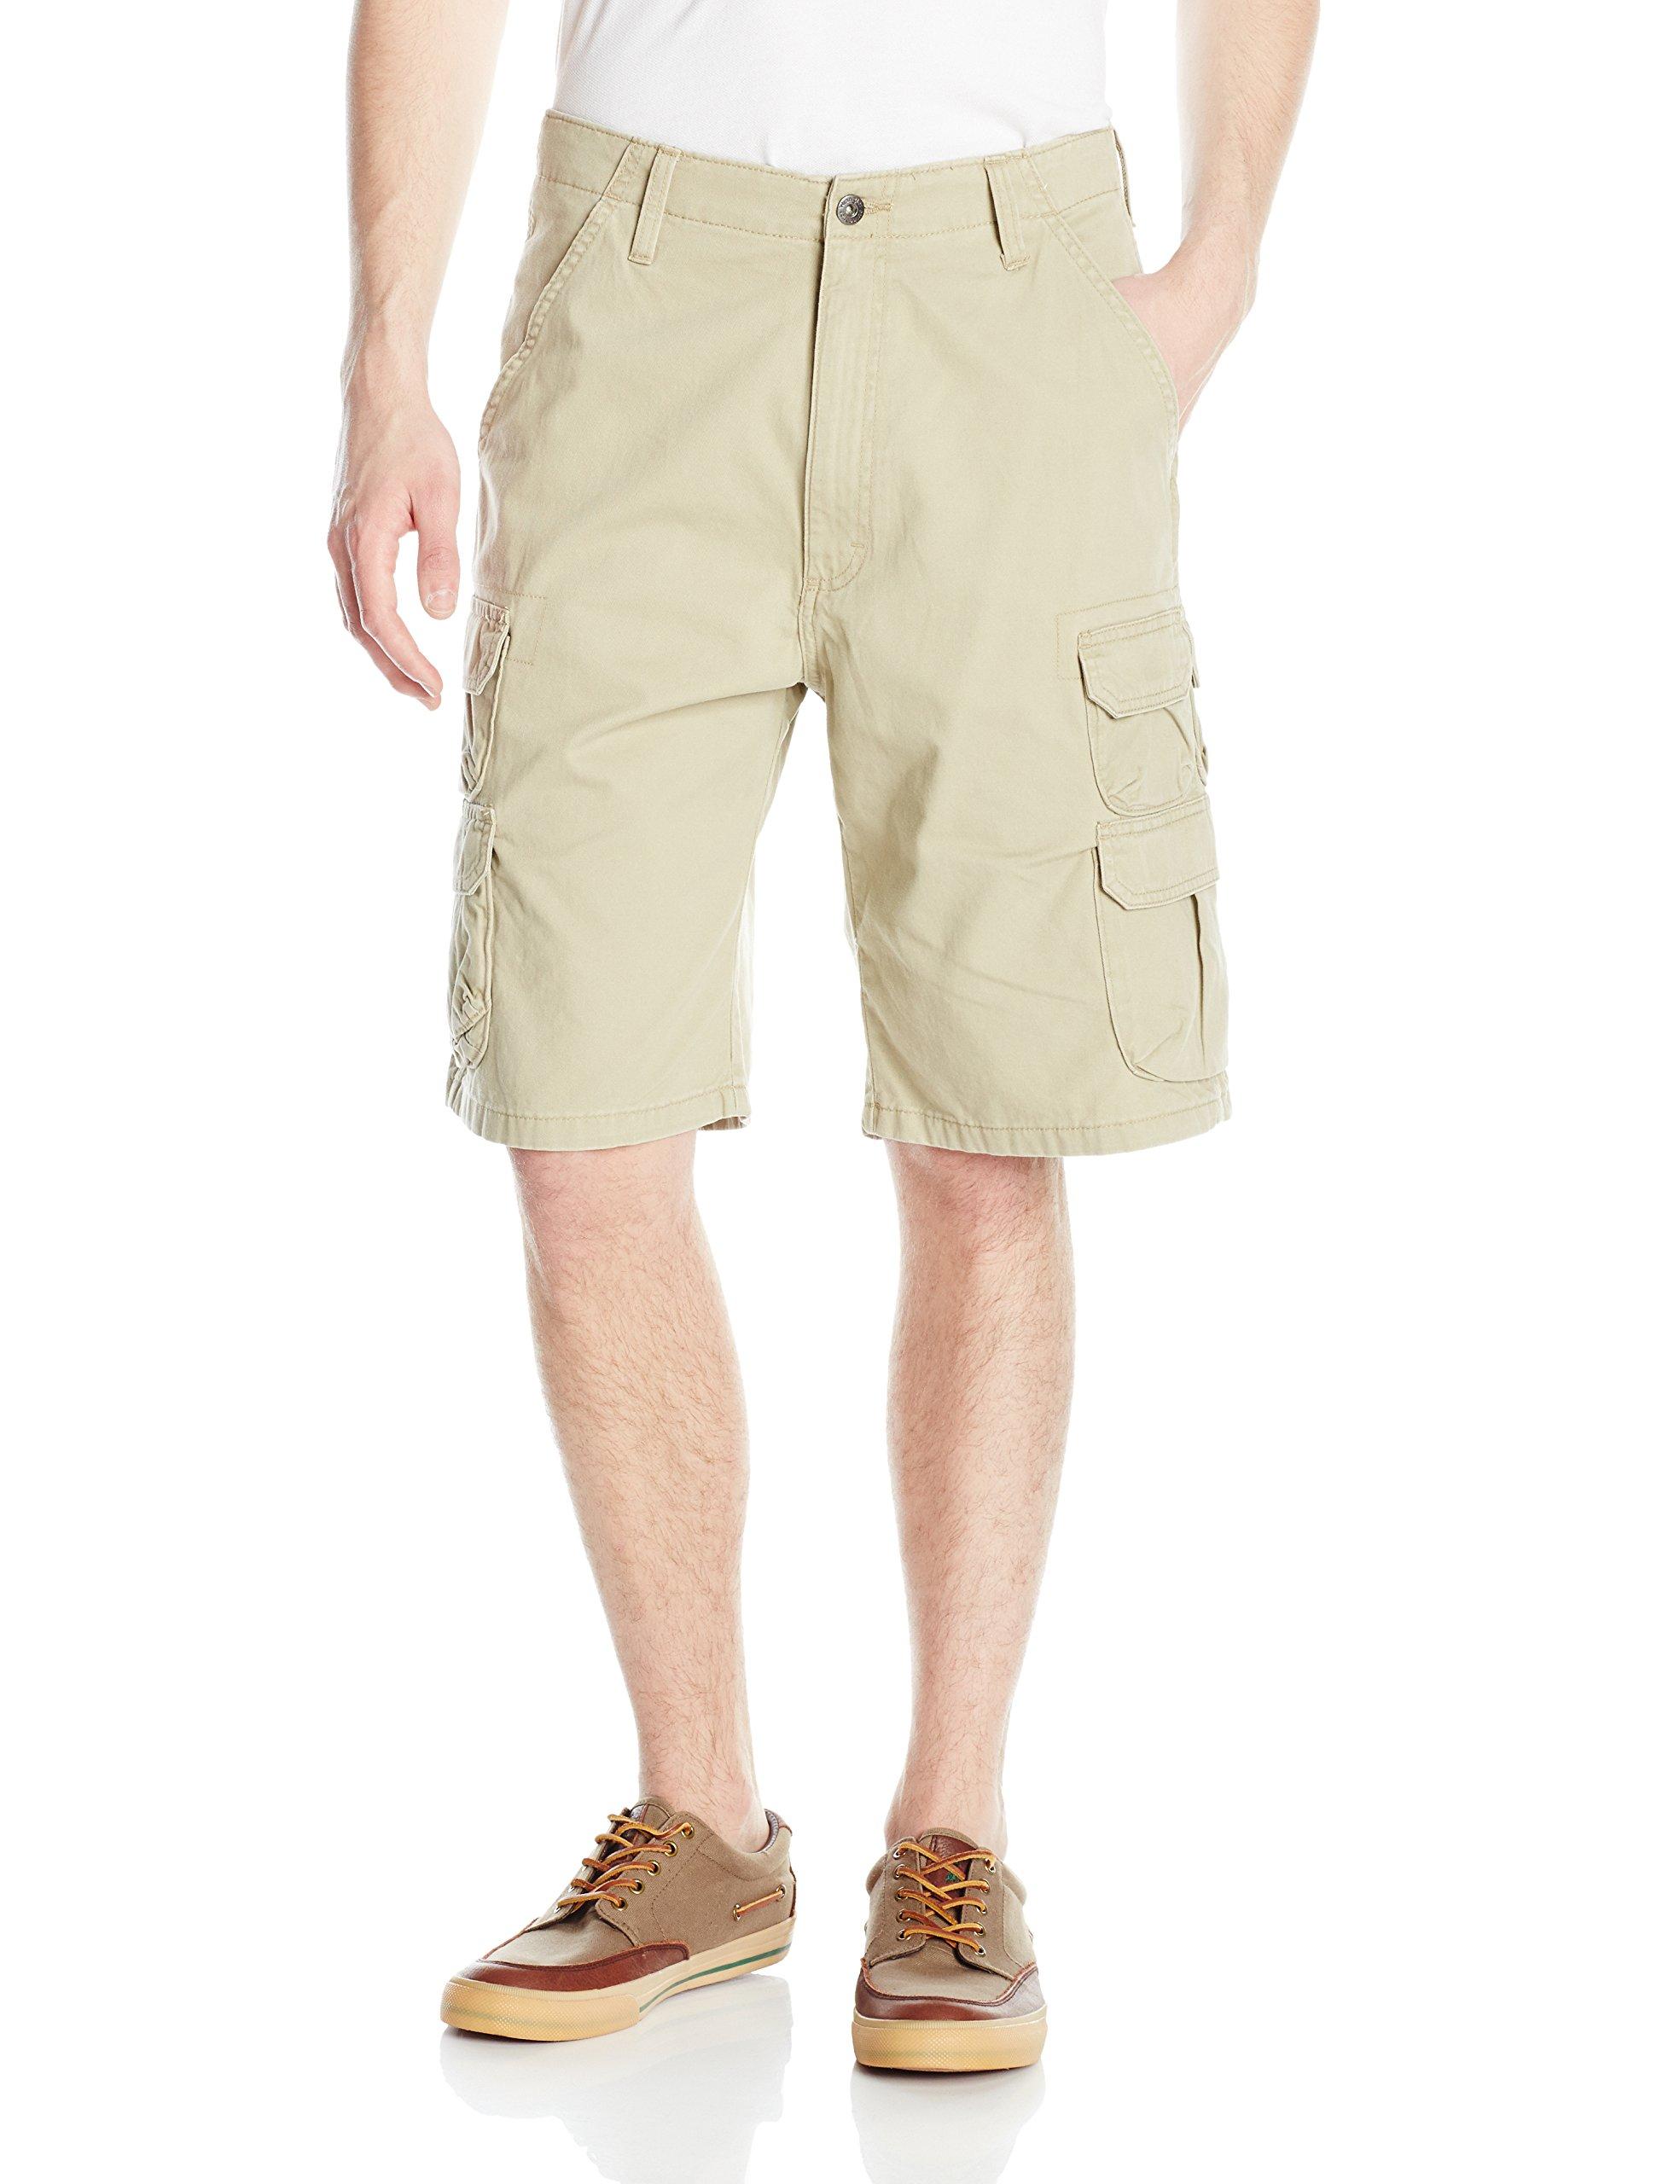 Wrangler Men's Big-Tall Authentics Premium Cargo Short, Camel, 48 by Wrangler